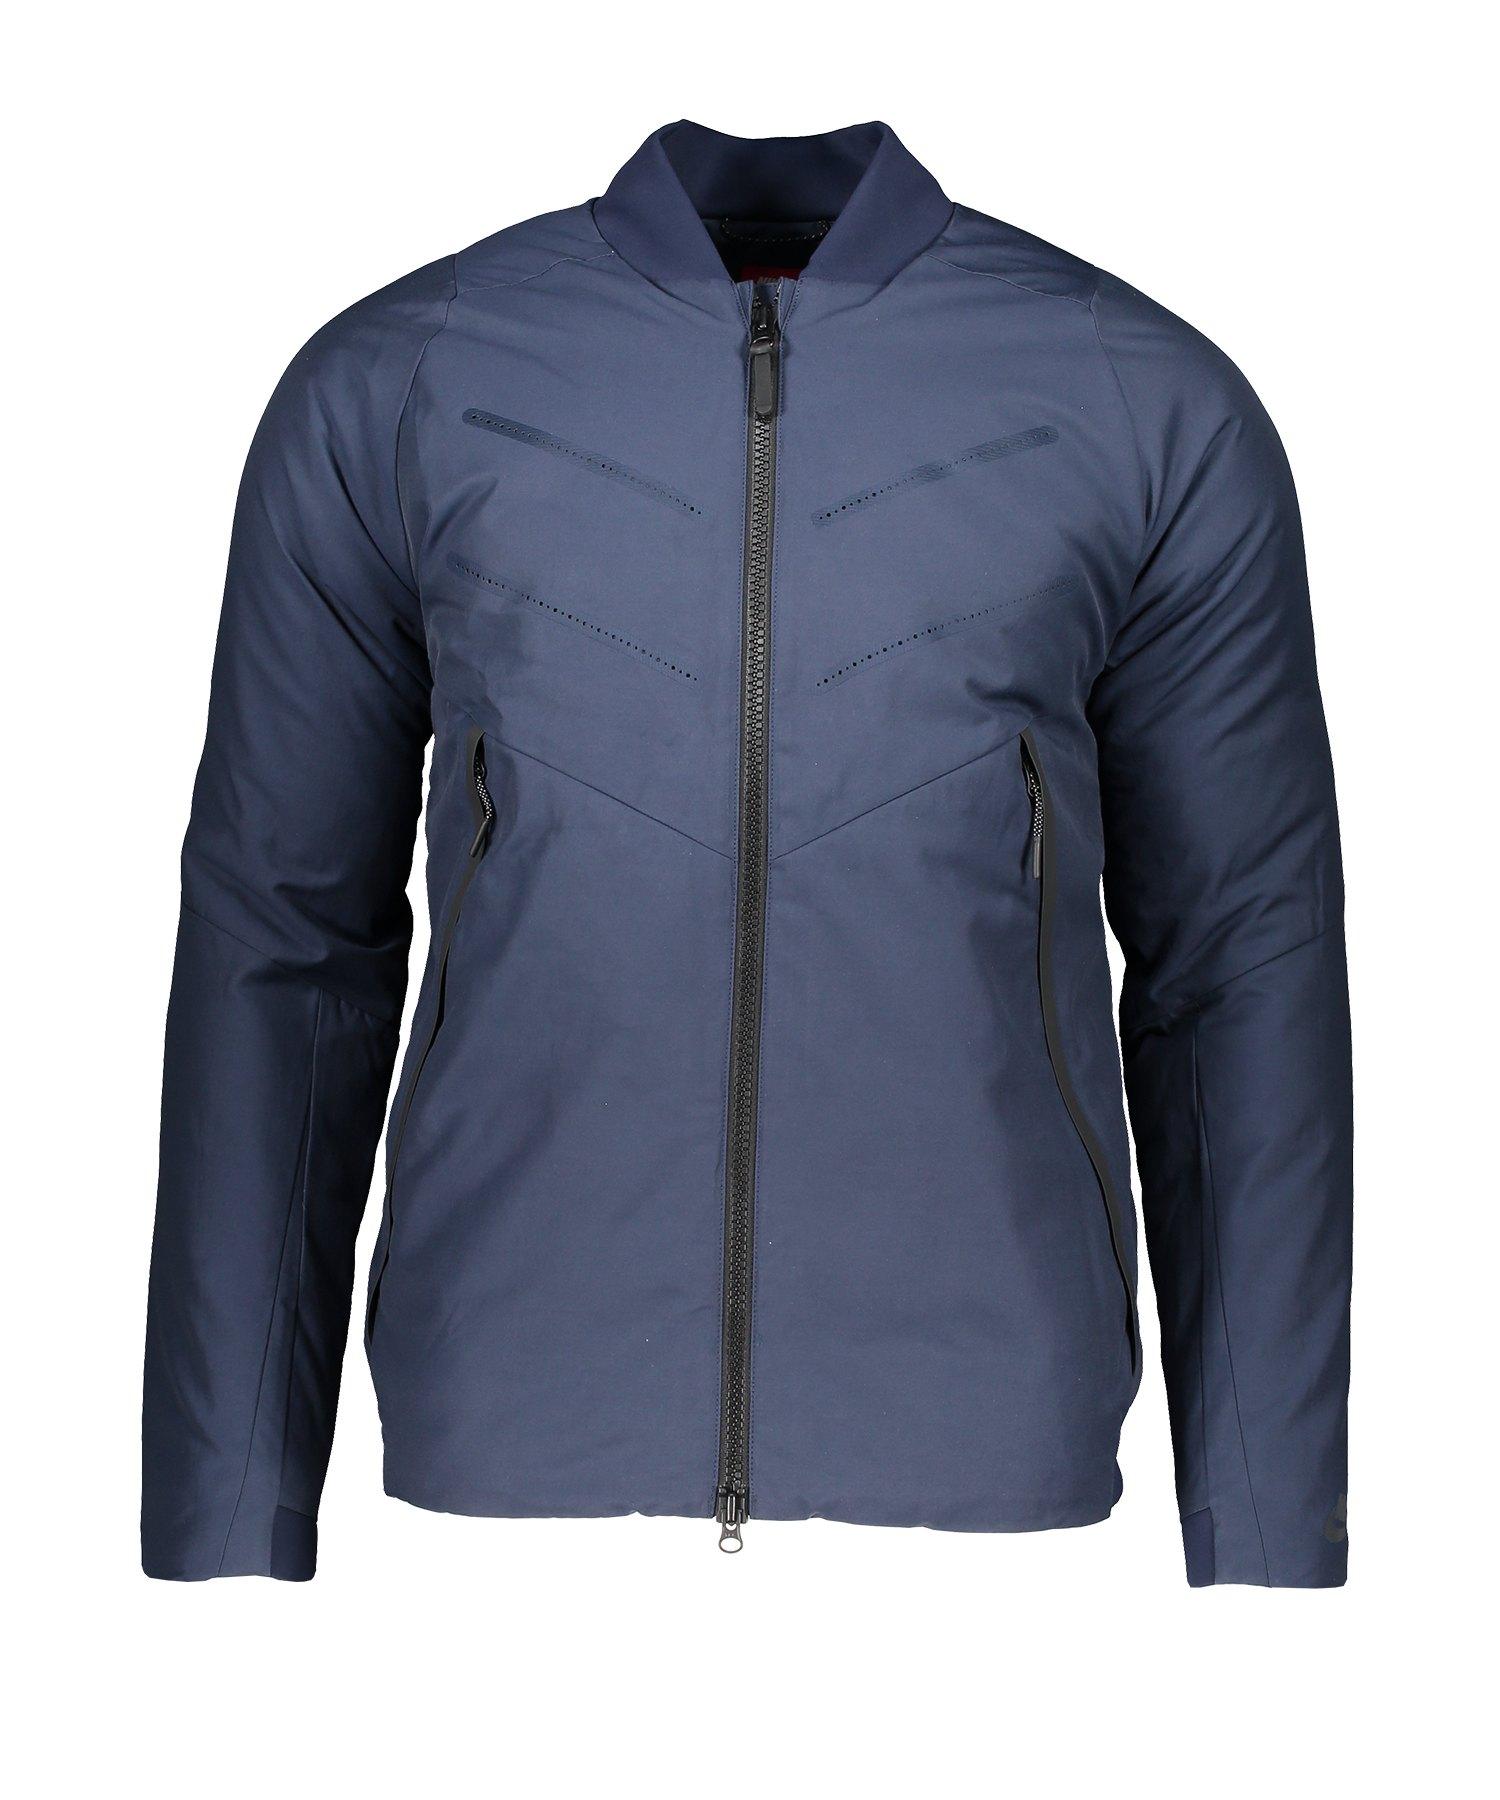 Nike AeroLoft Bomber Jacket Jacke Blau F451 - blau